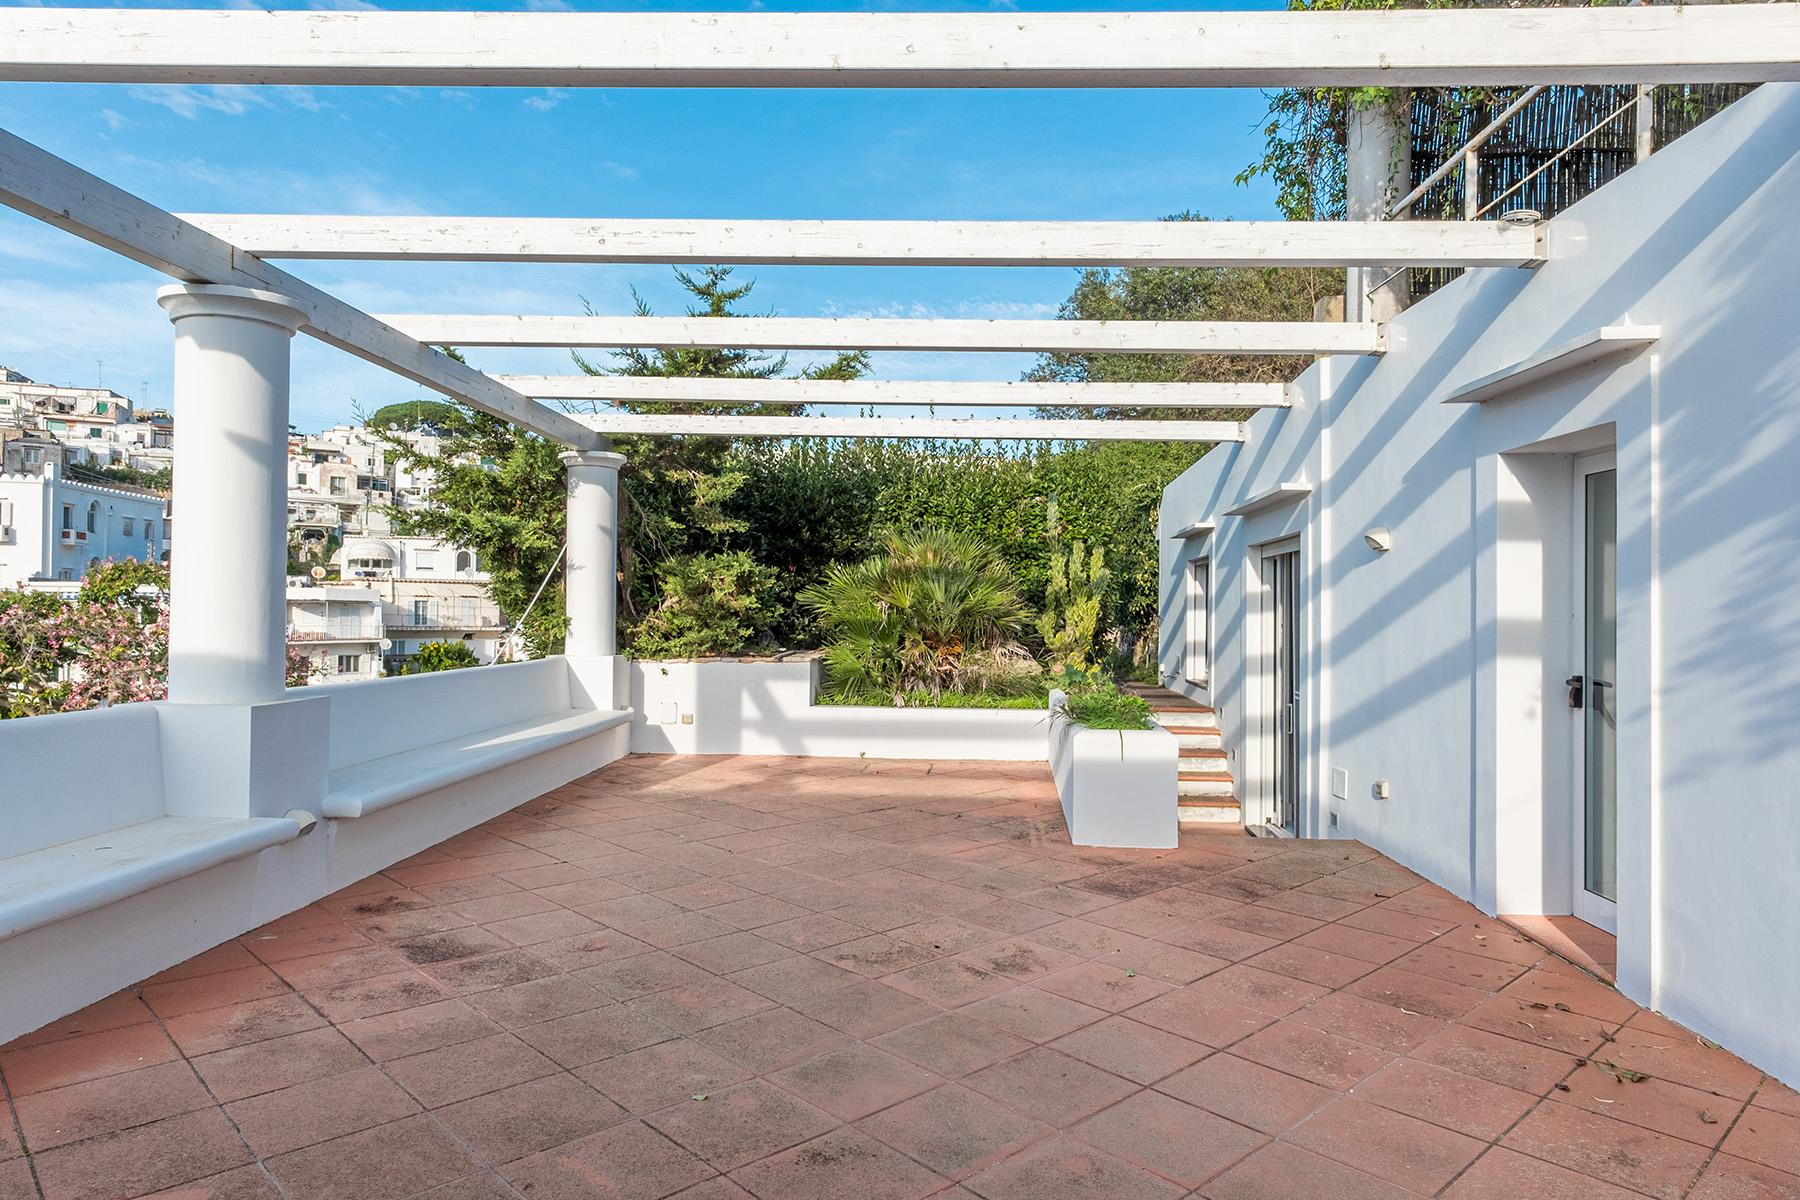 Panoramic villa with swimming pool in Anacapri city center - 4